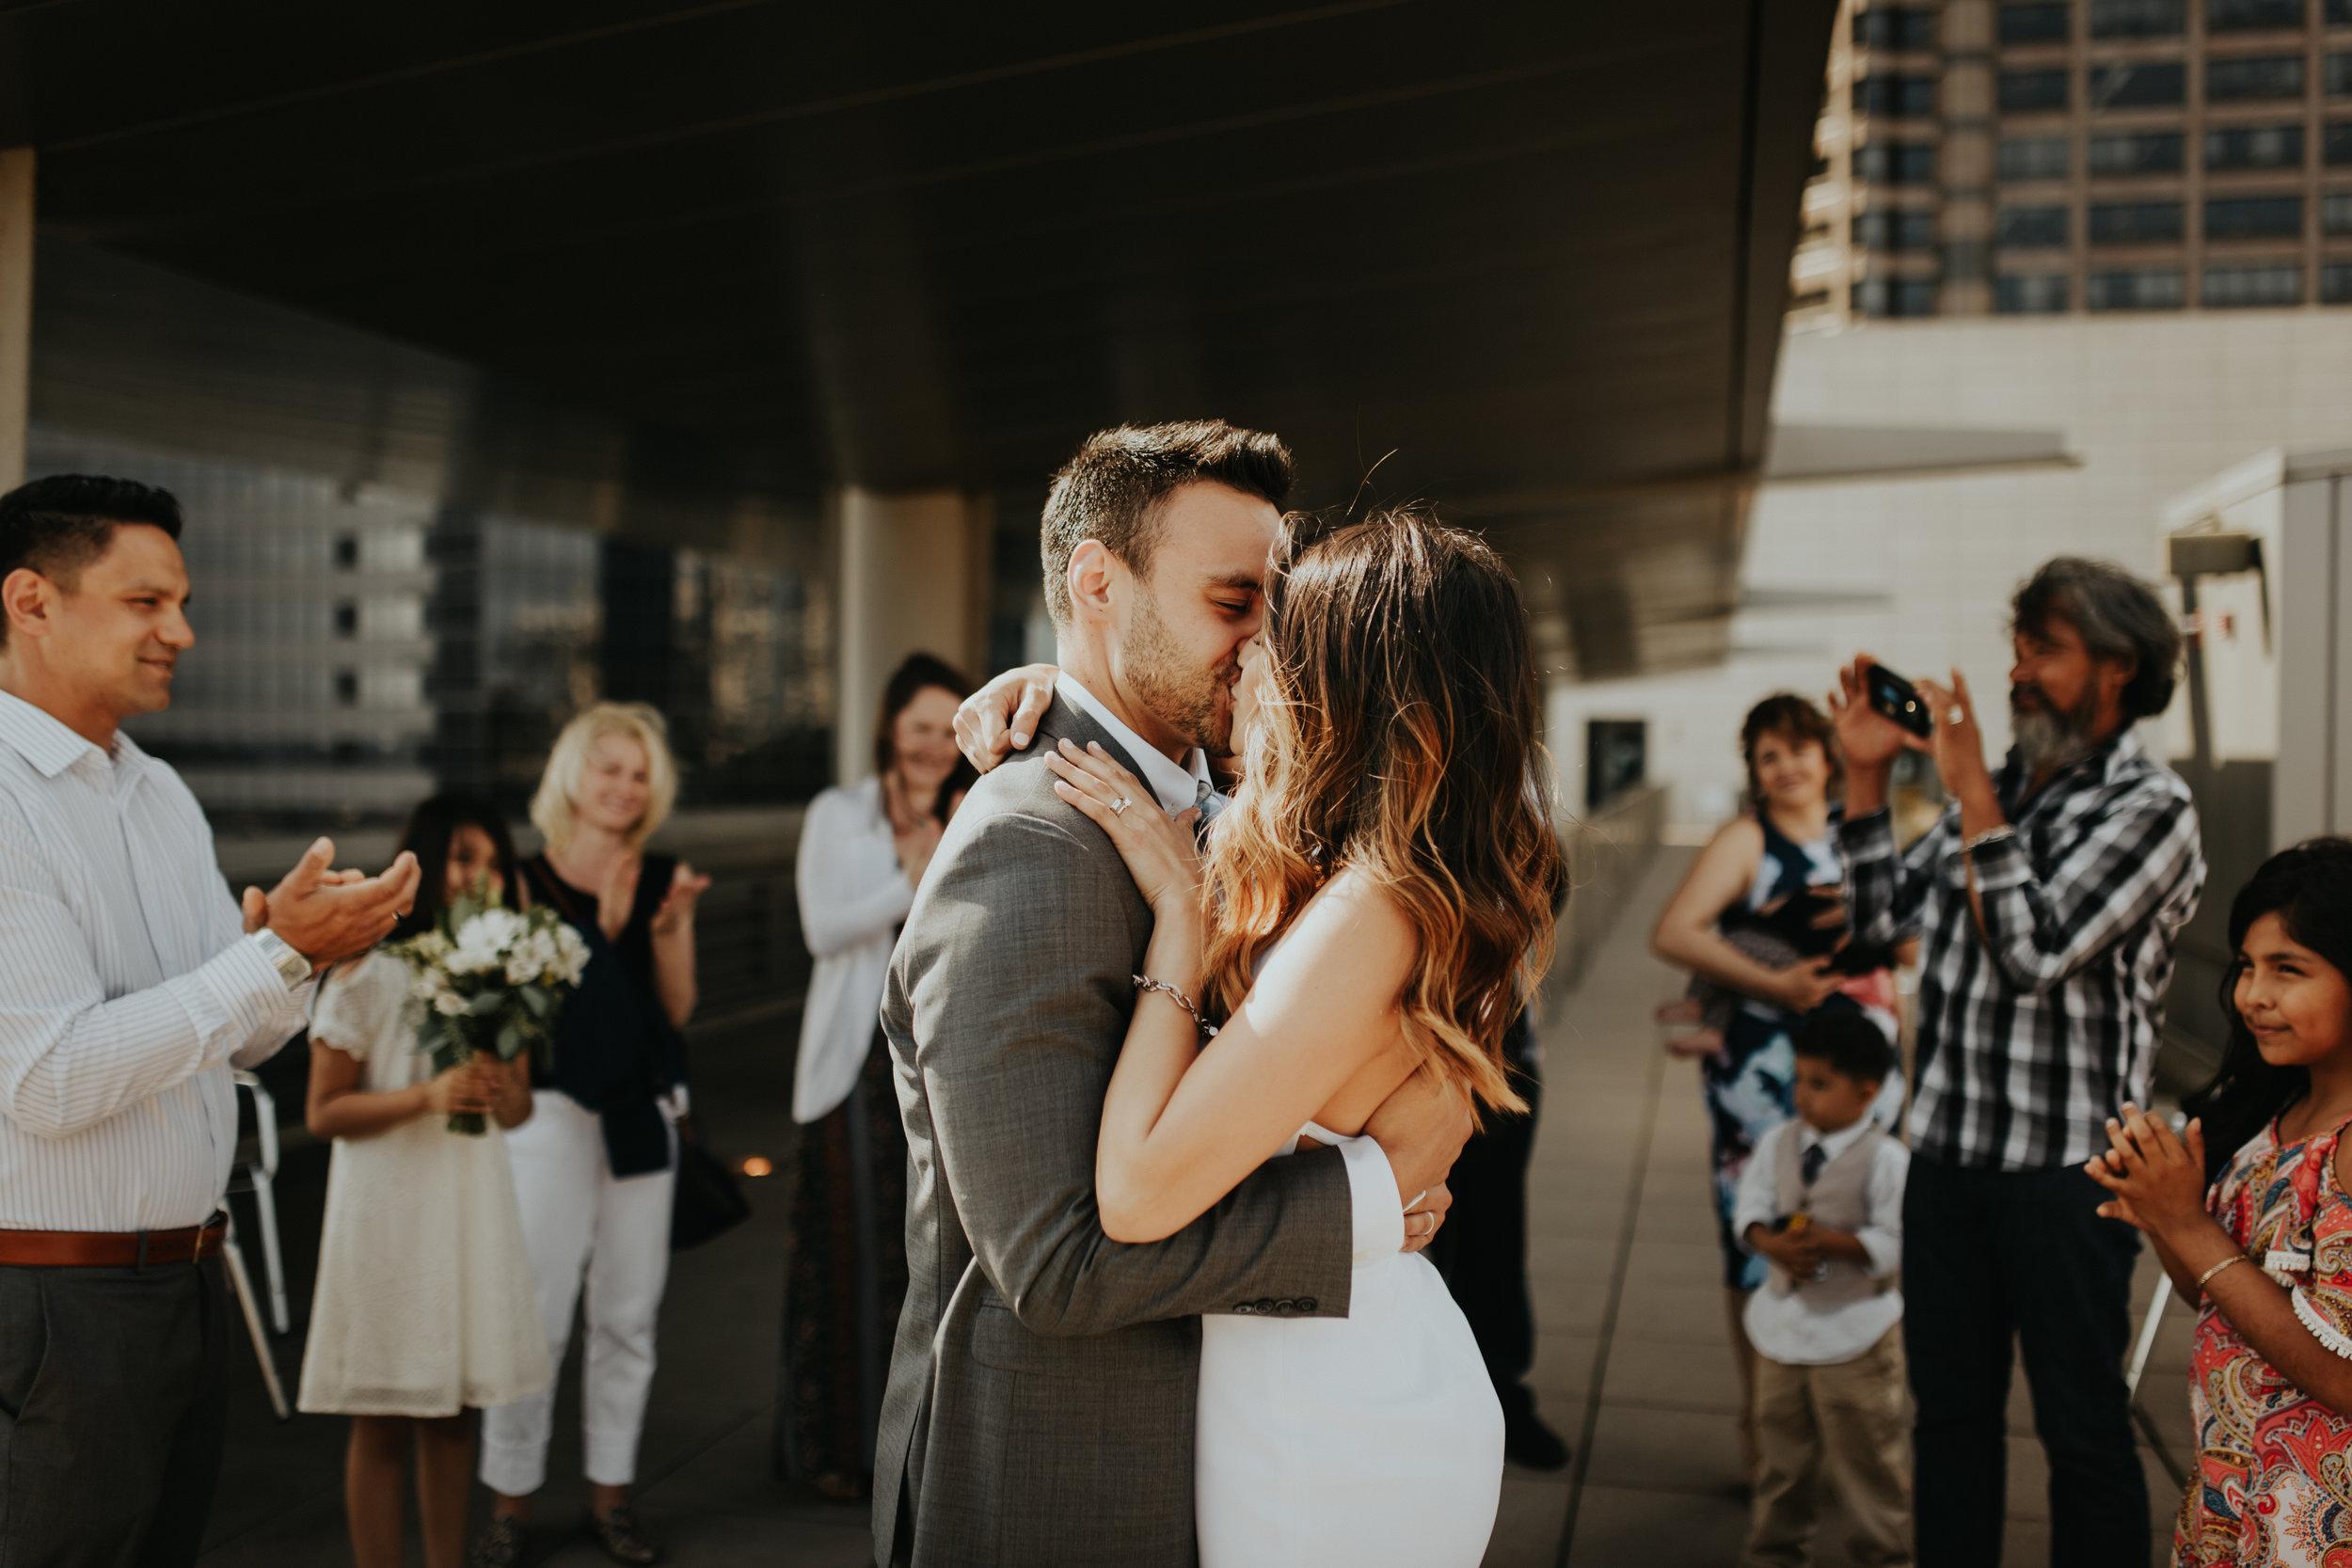 Seattle Courthouse Wedding | Seattle Wedding Photographer | Krissie Francis Photo